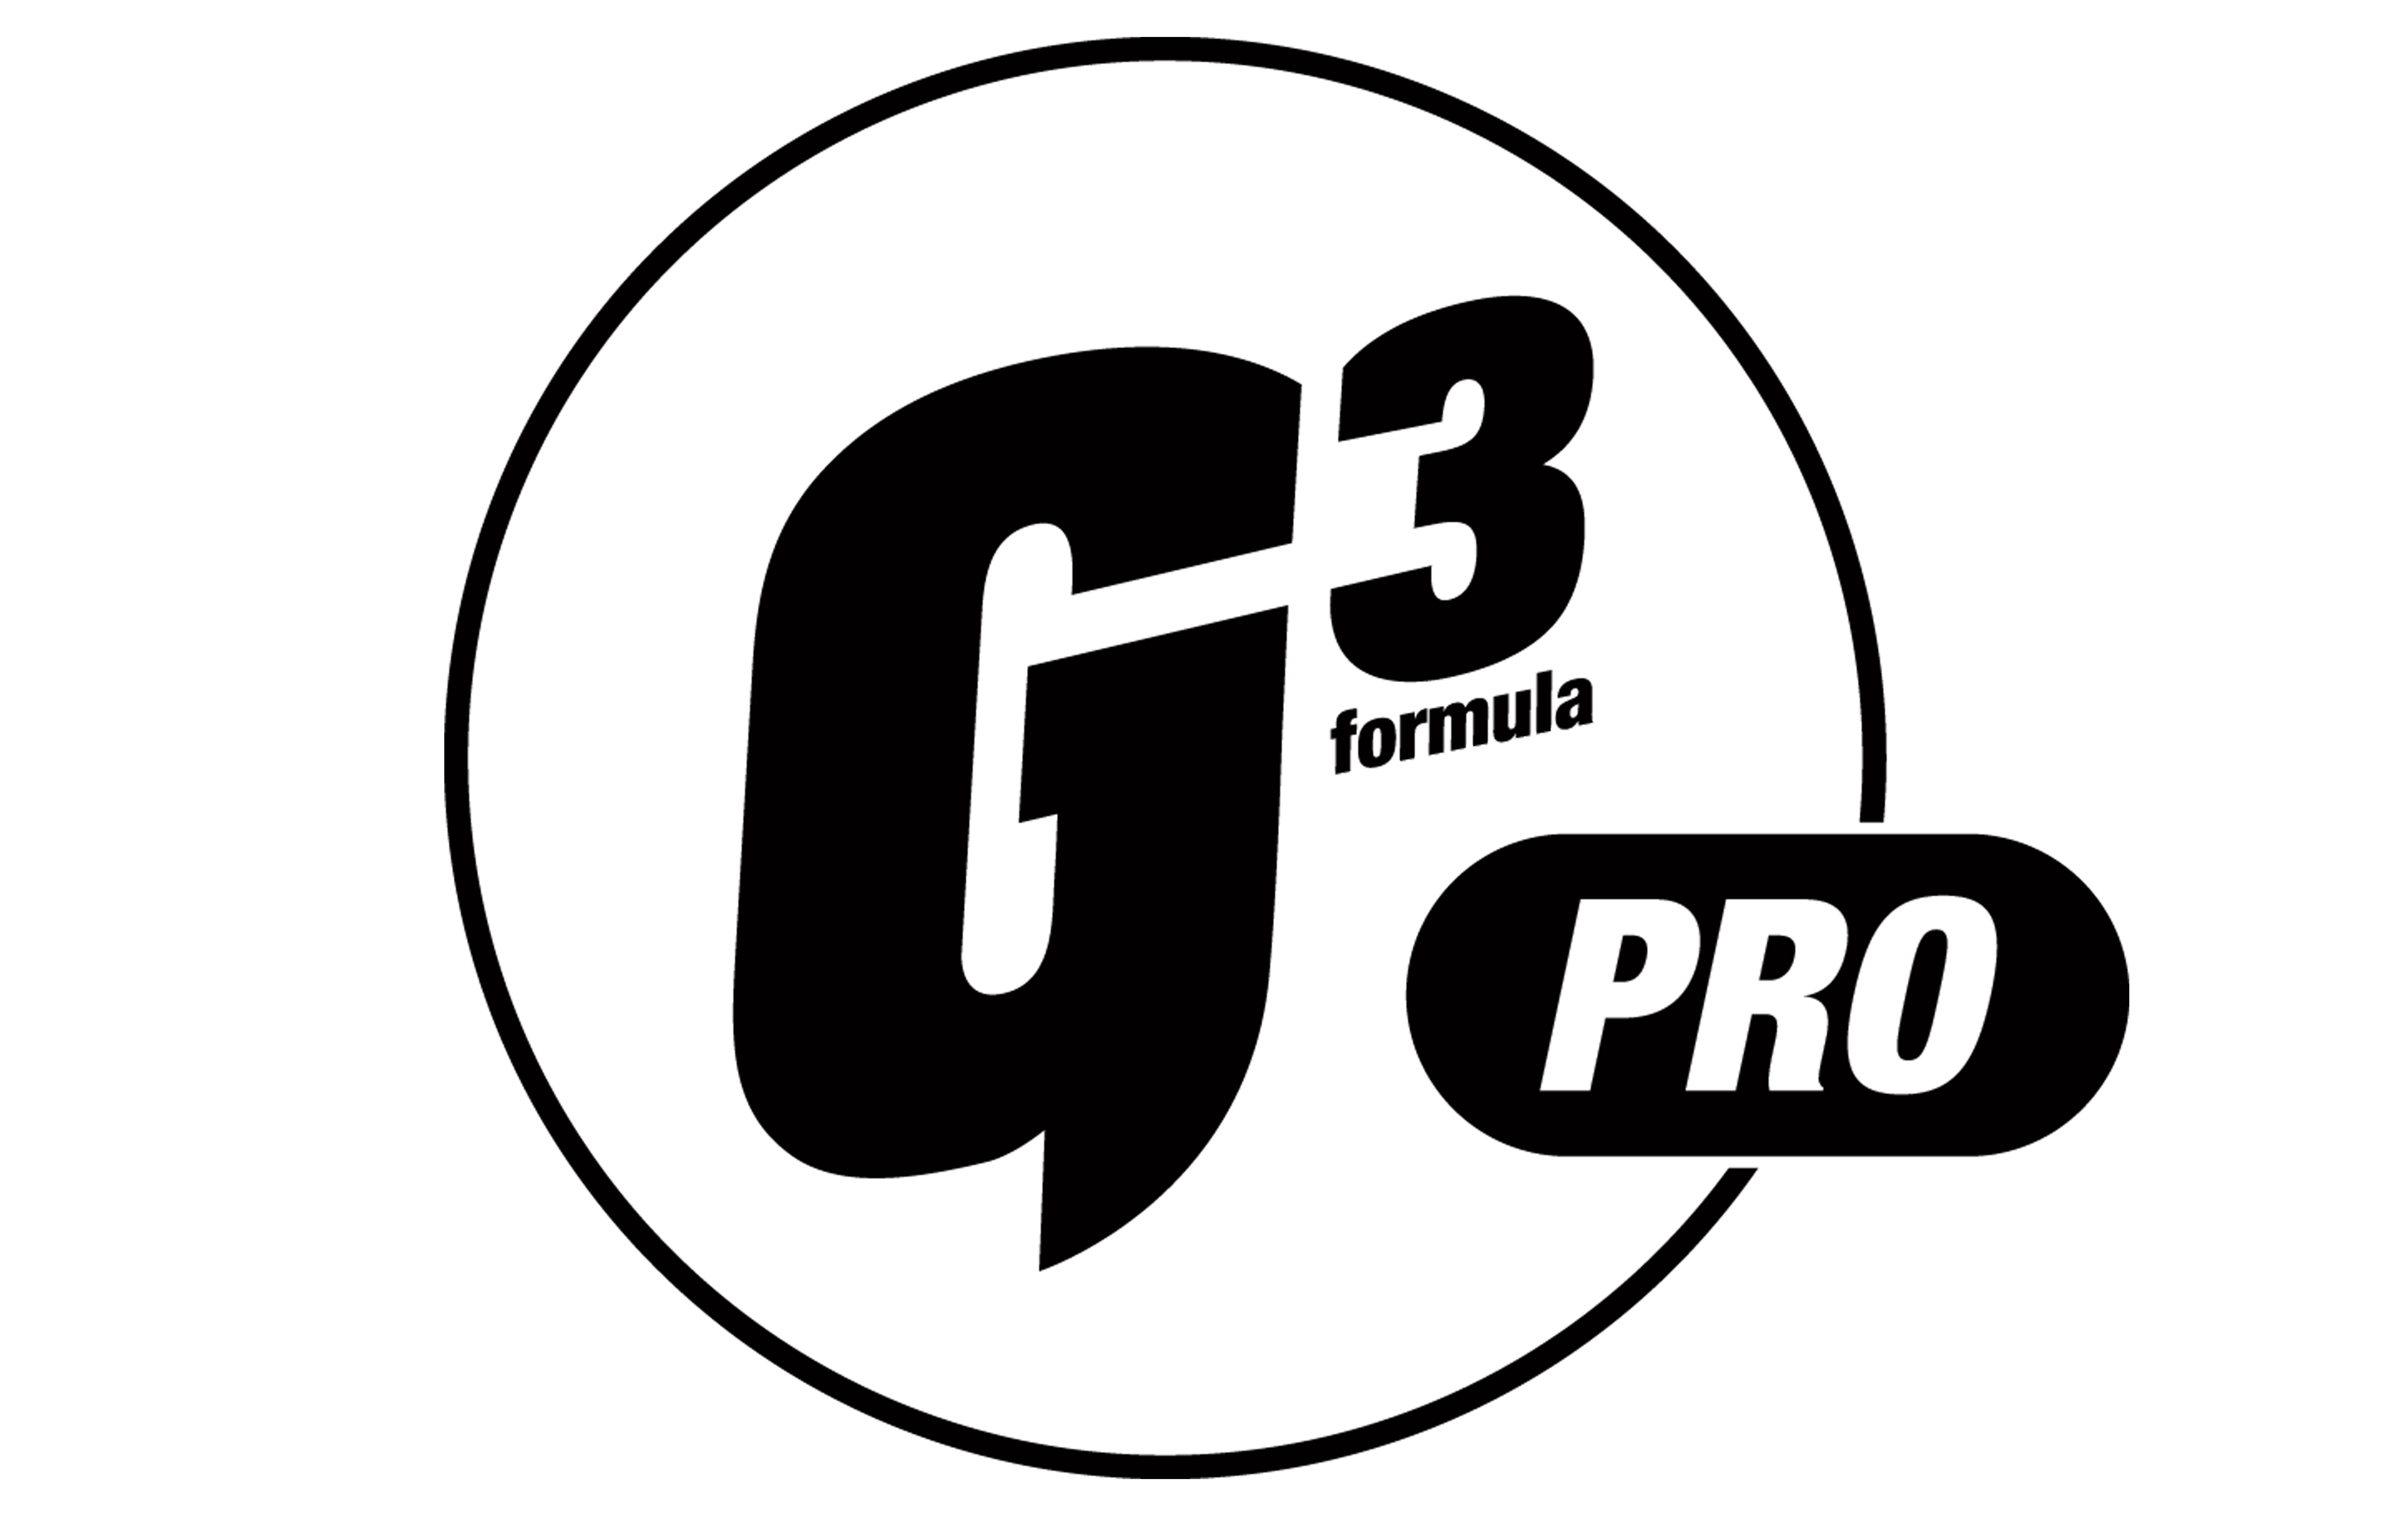 SFmedia partner G3